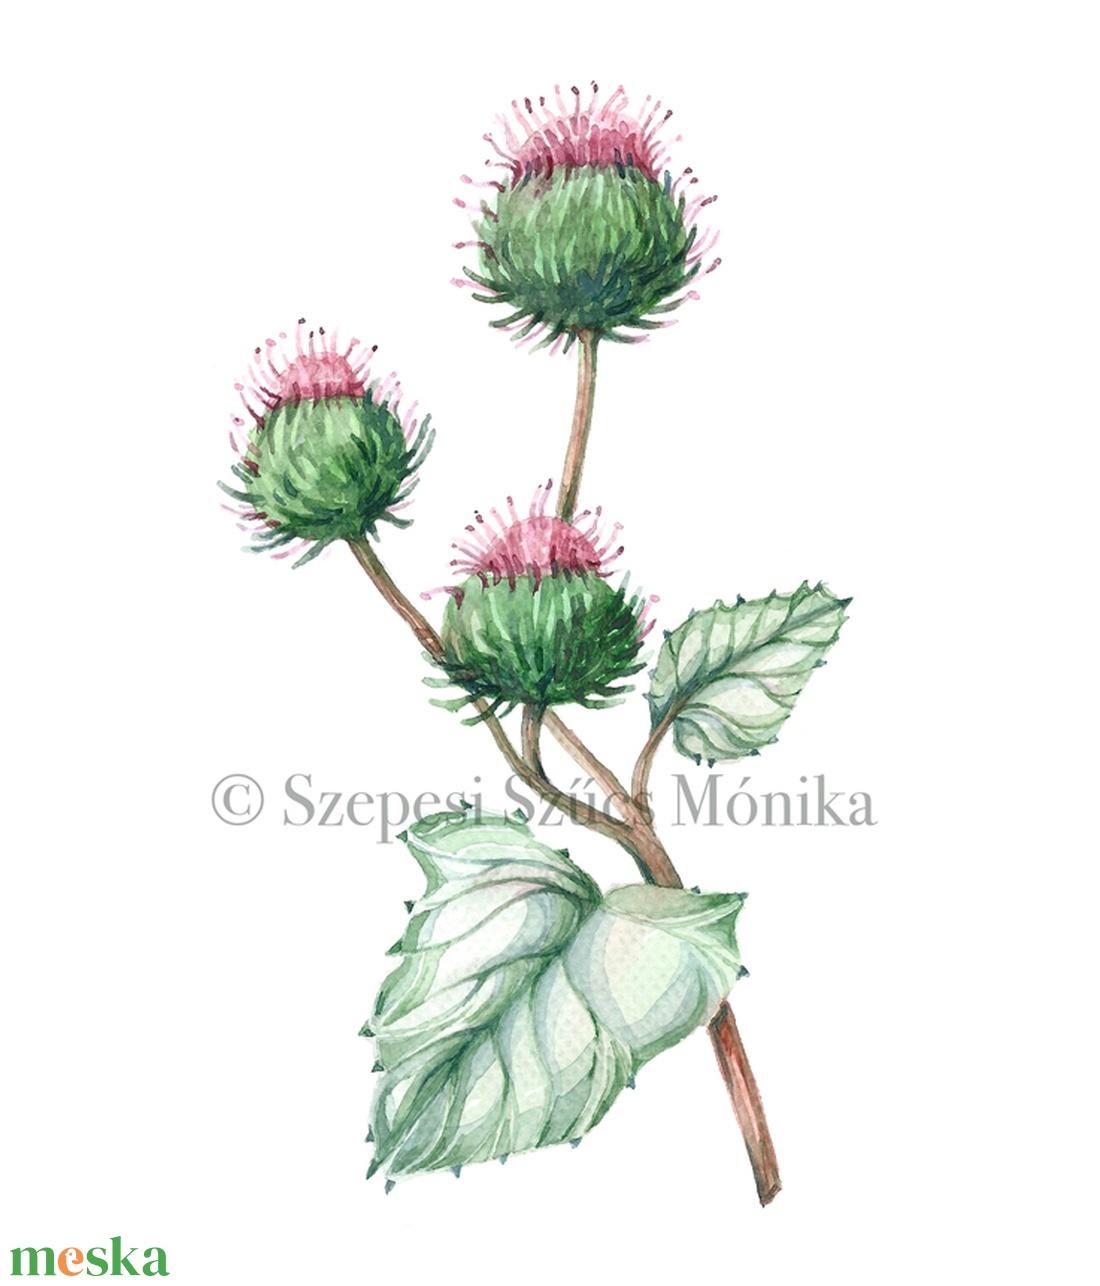 Bojtorján - Print (Akvarell) (BotanikAkvarell) - Meska.hu